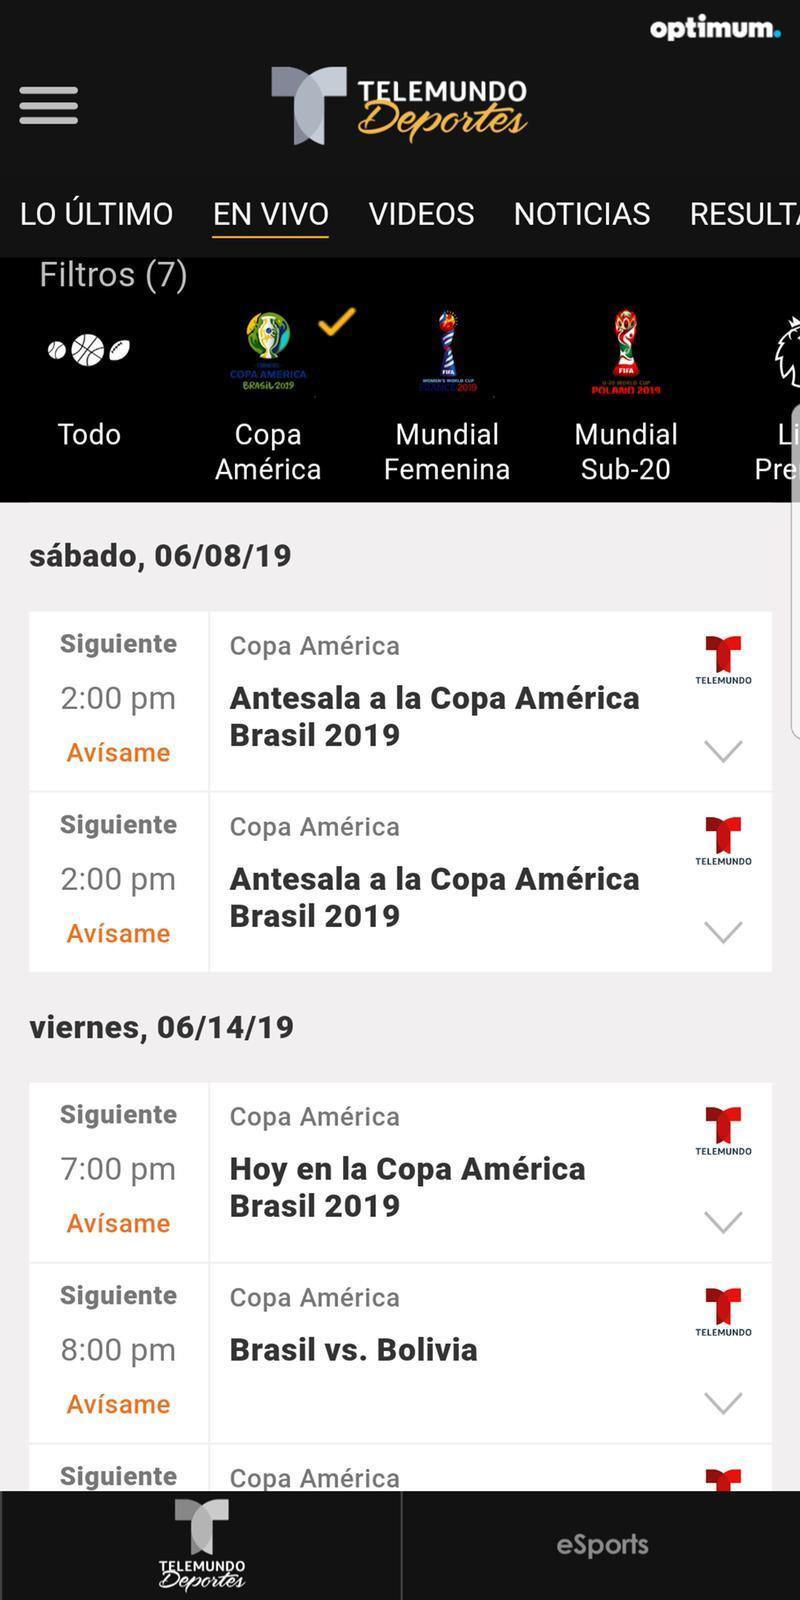 Telemundo Deportes for Android - APK Download